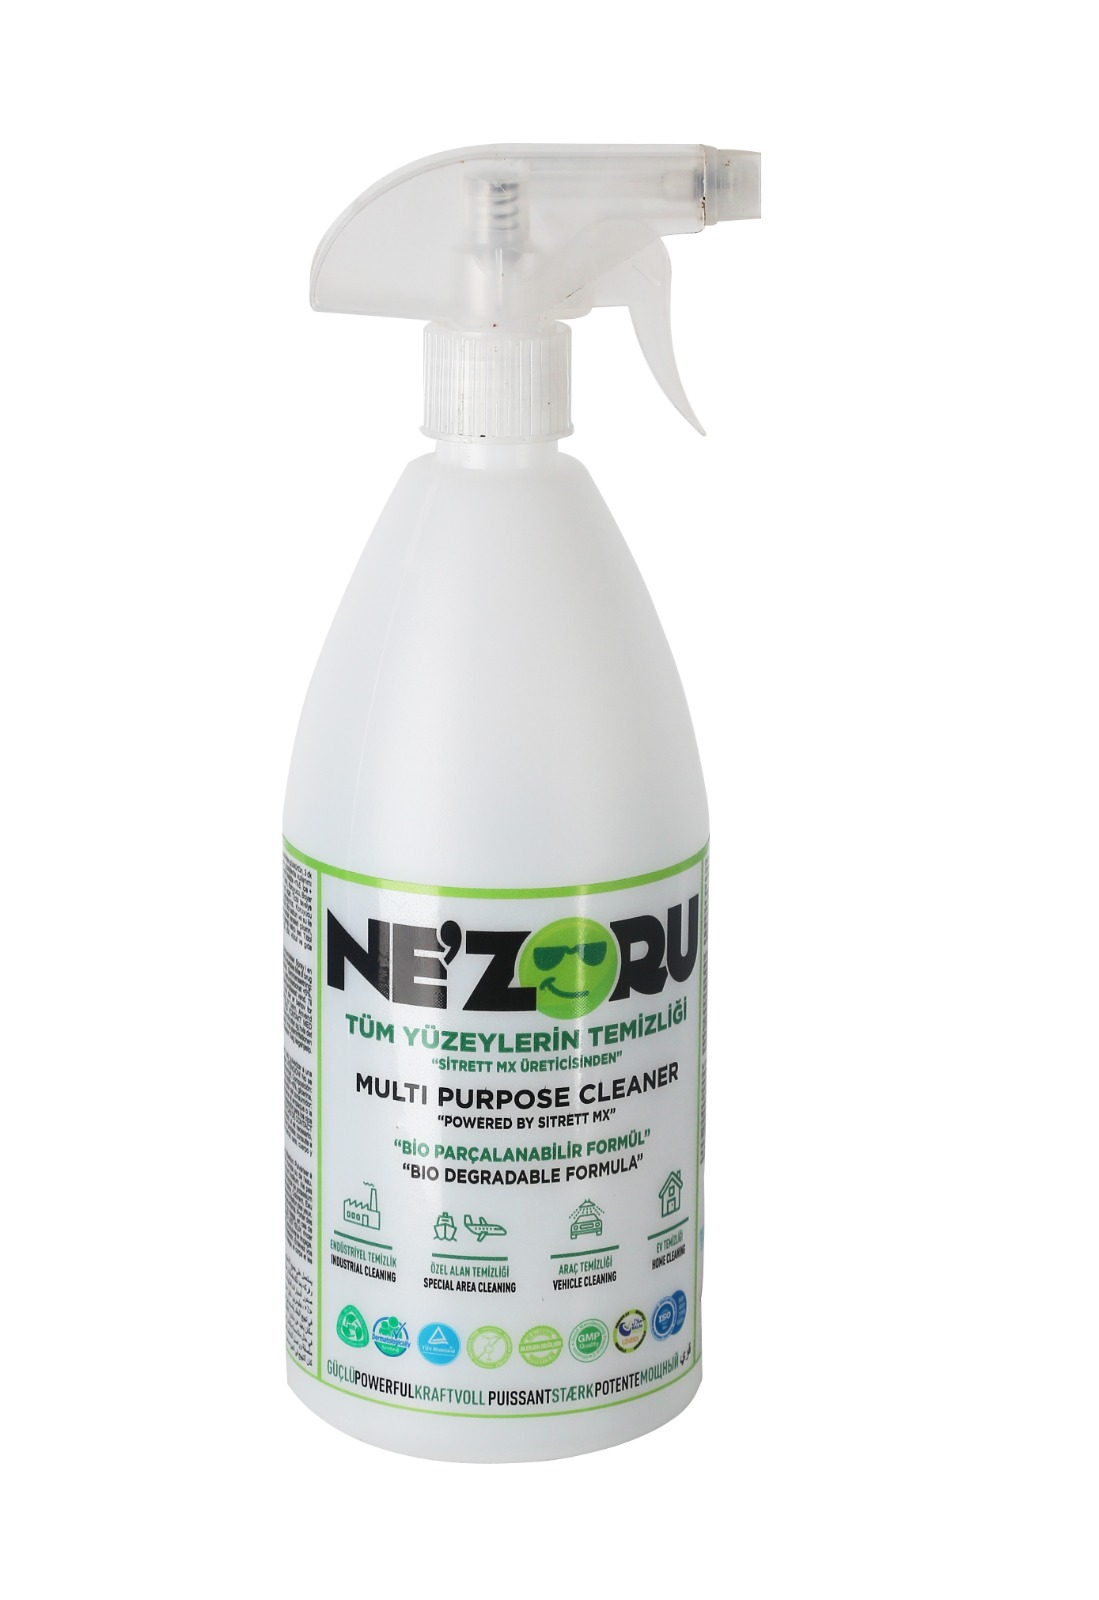 NE'ZORU MULTI PURPOSE CLEANER 700 ML